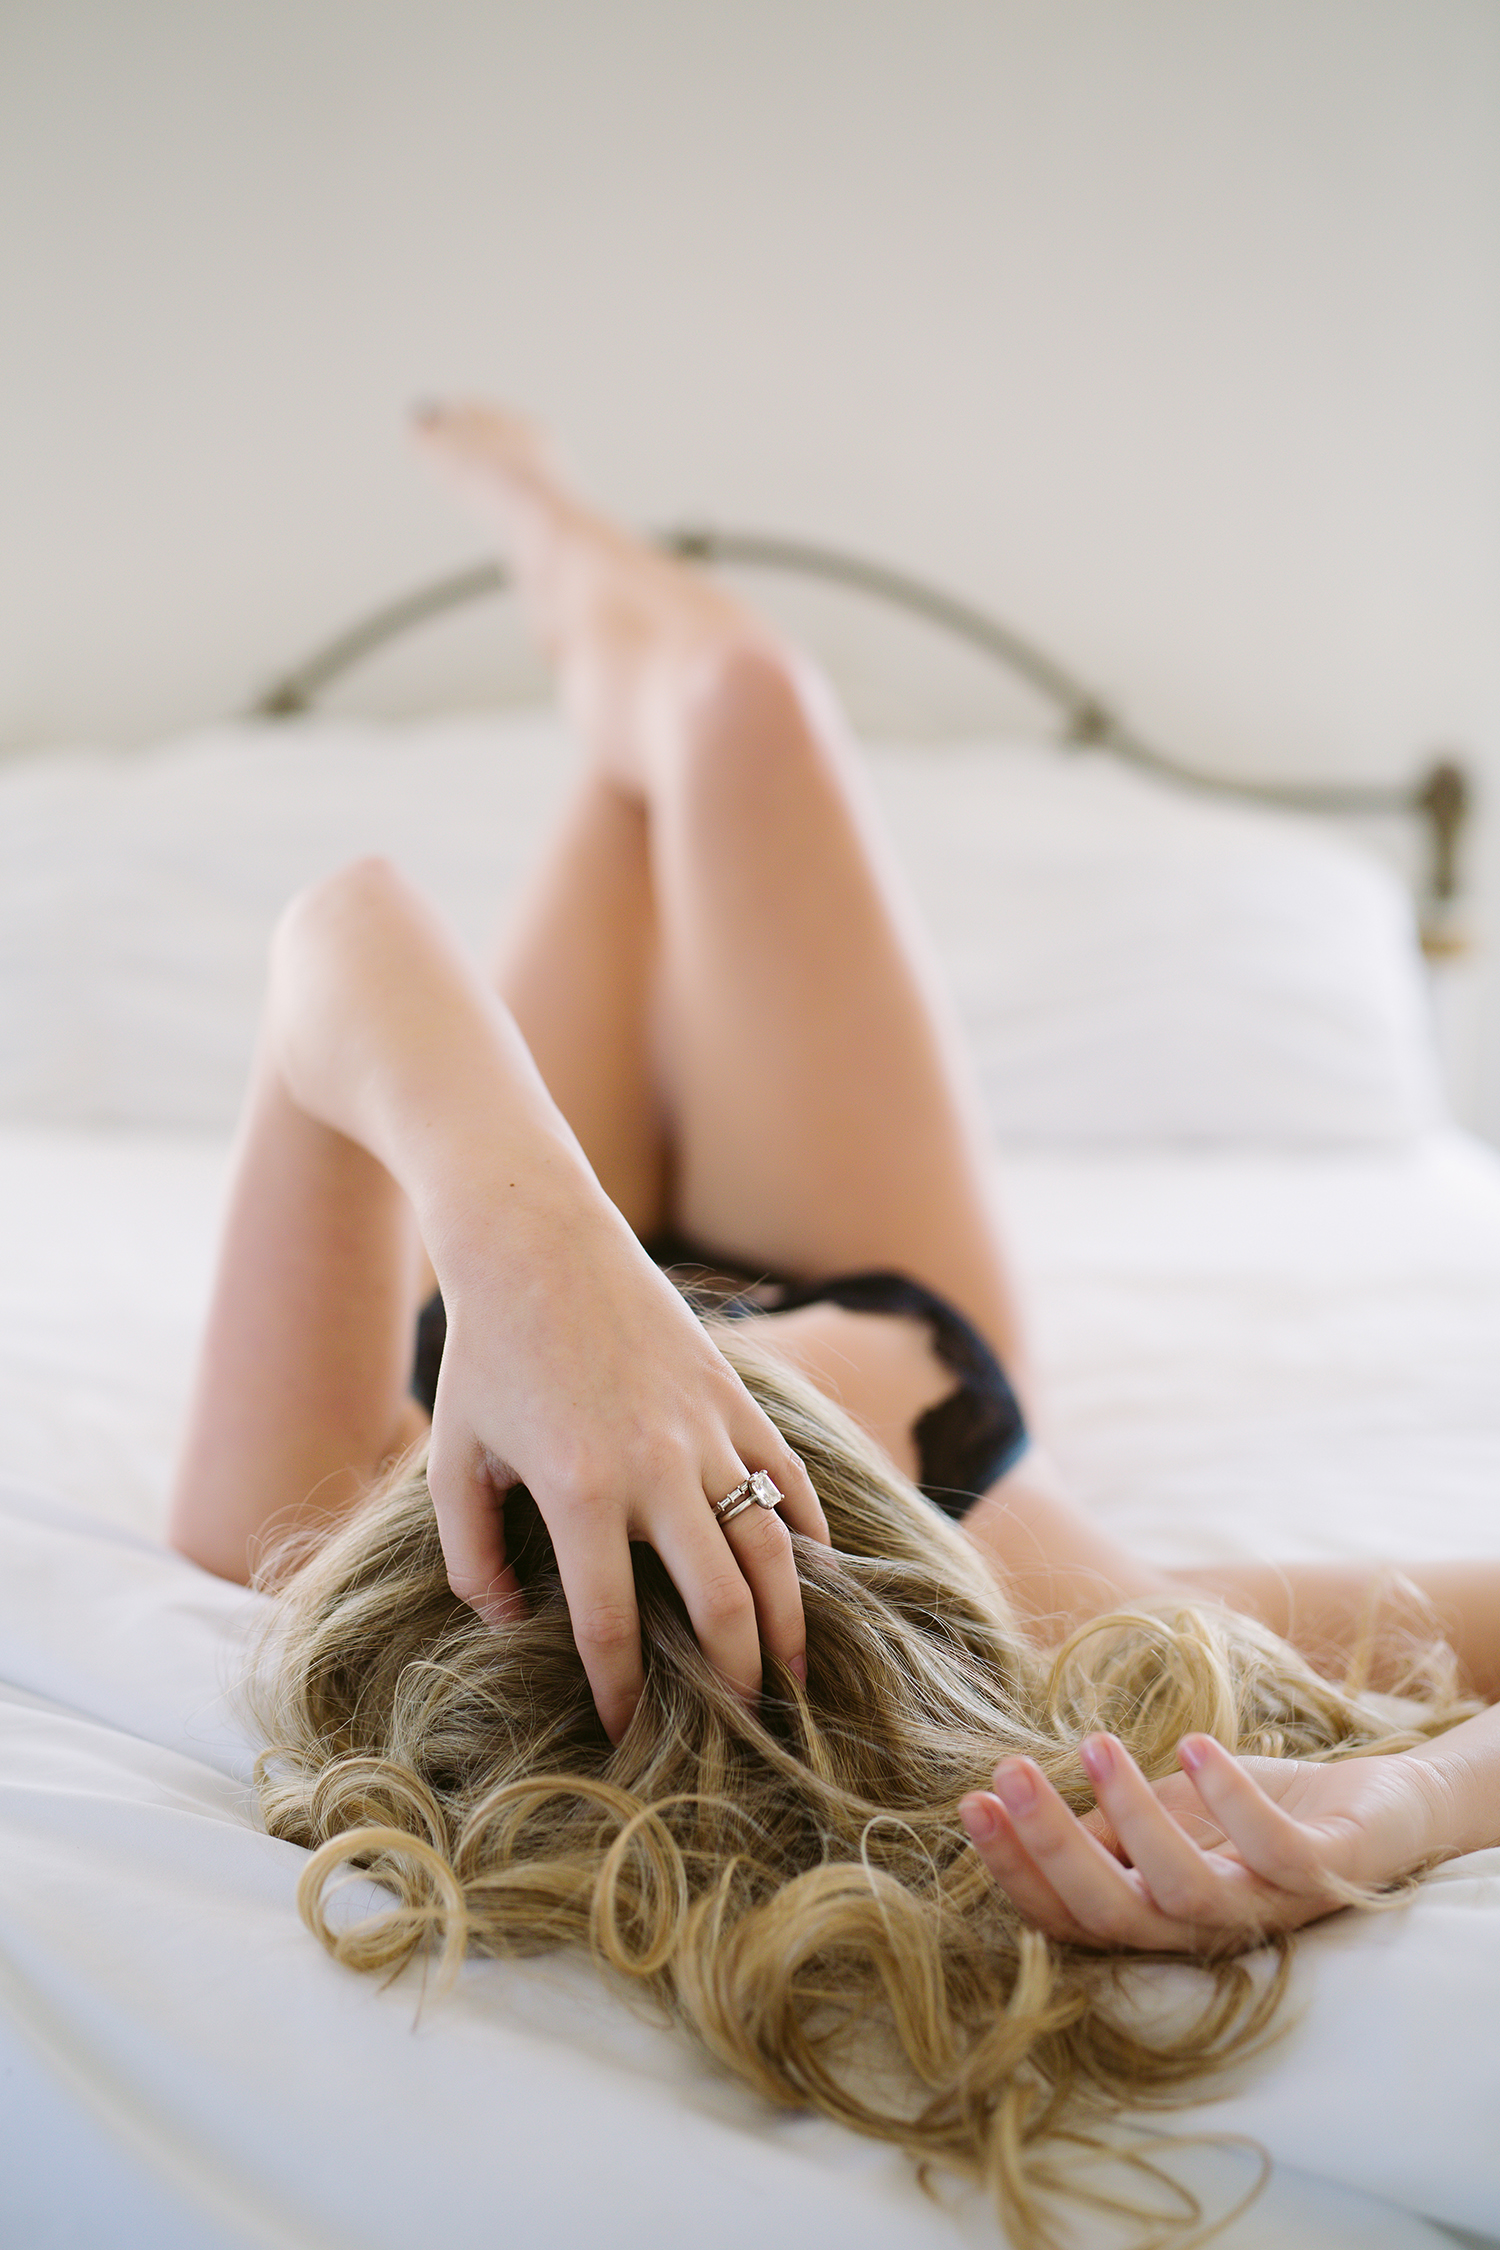 austin-bridal-boudoir-kimberly-brooke-20.jpg